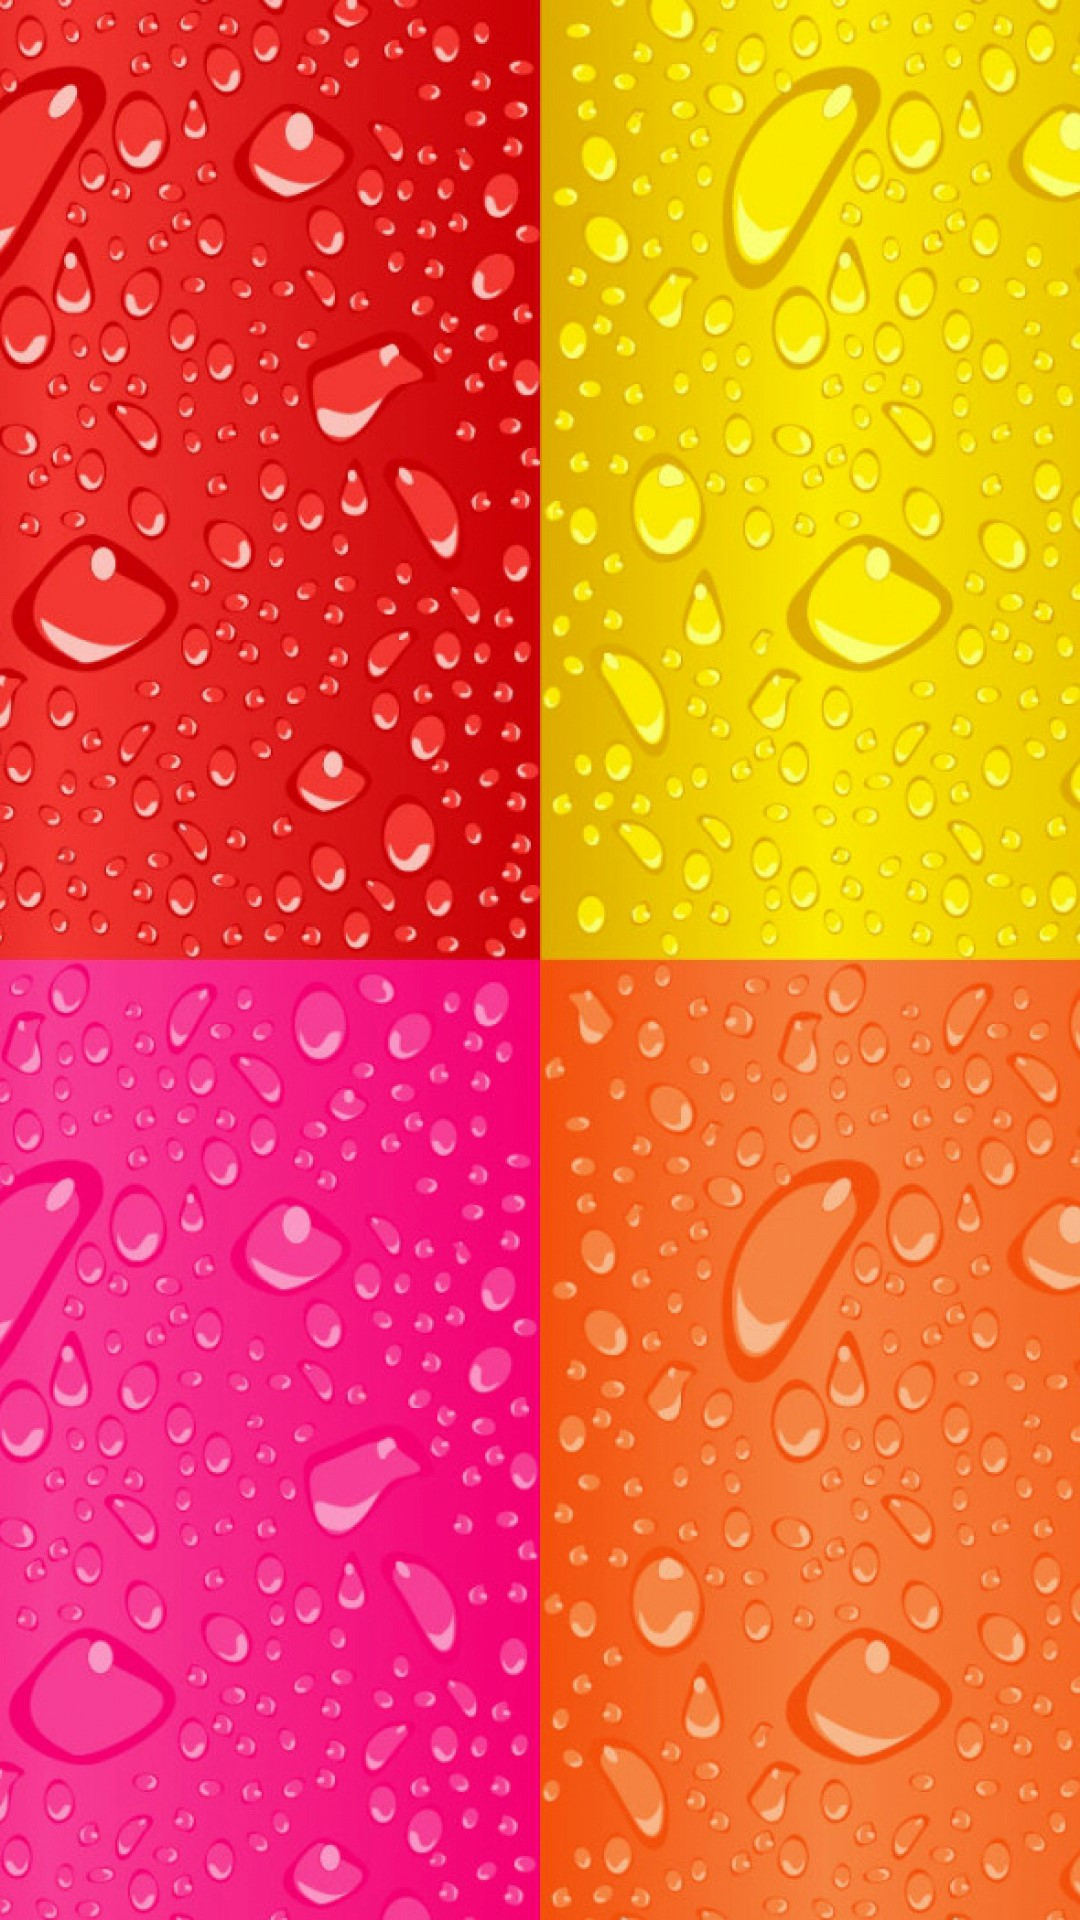 roxo laranja squares dew drops android